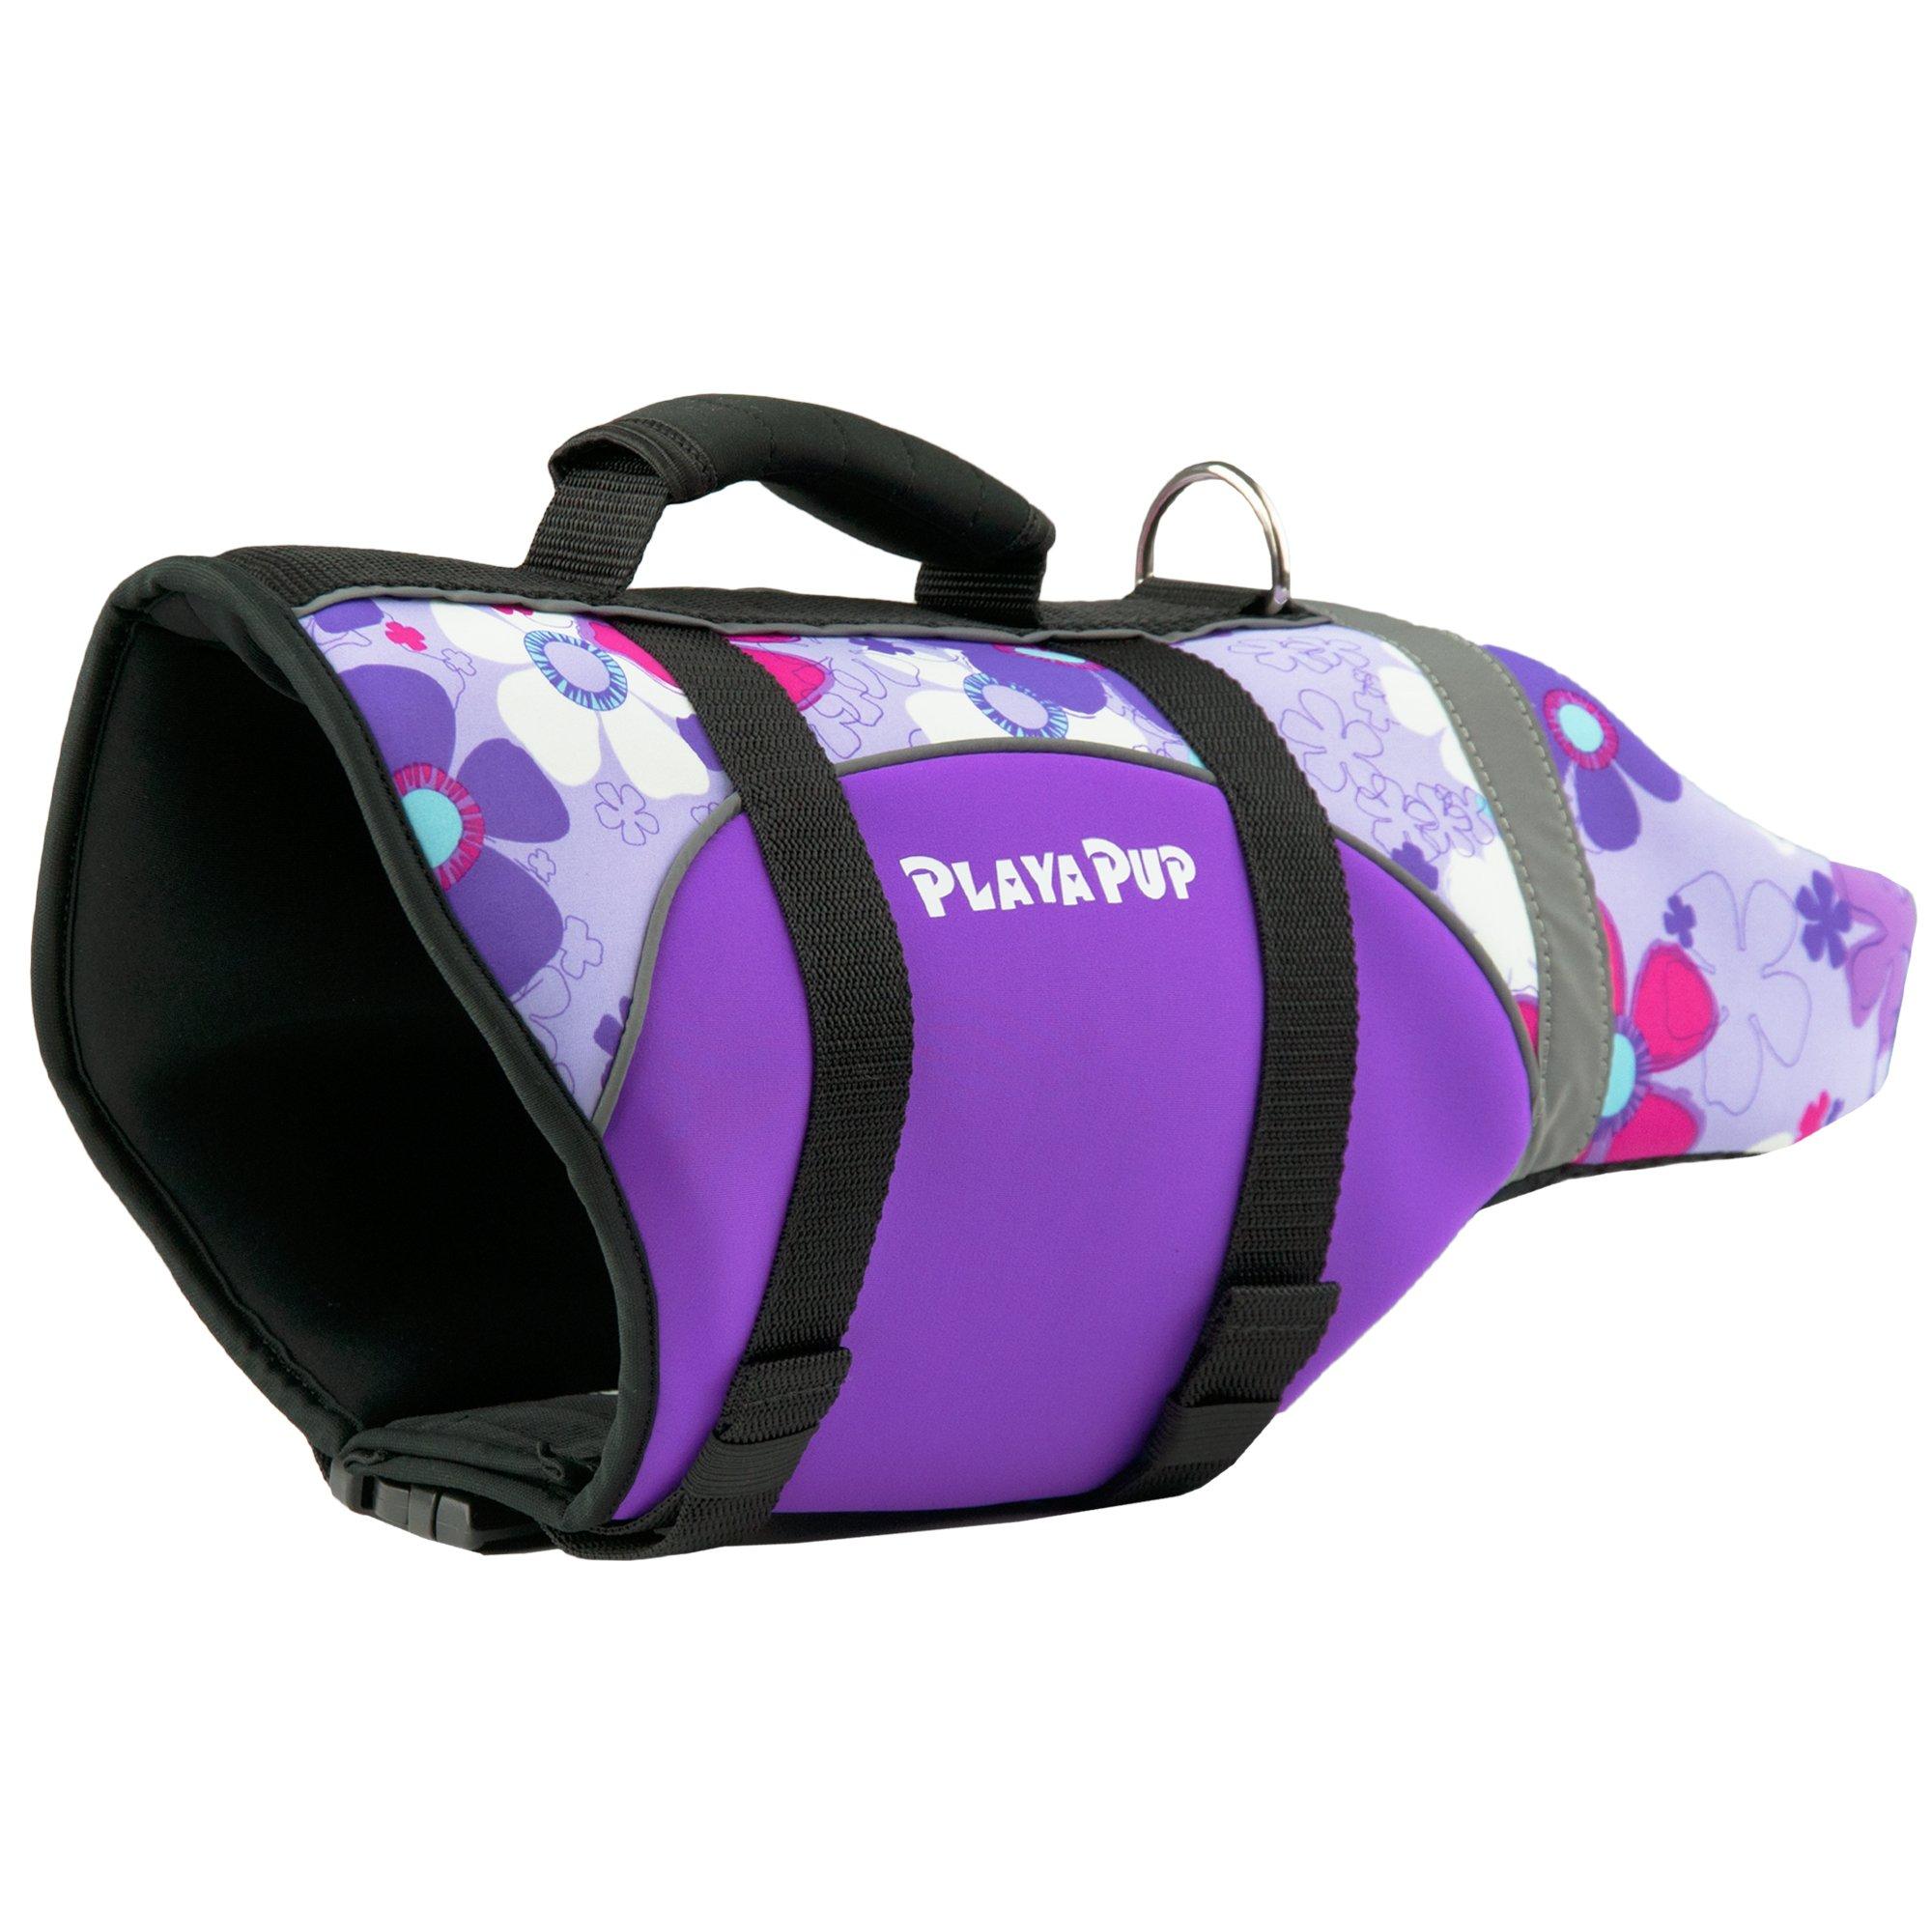 Playa Pup Orchid Dog Flotation Vest